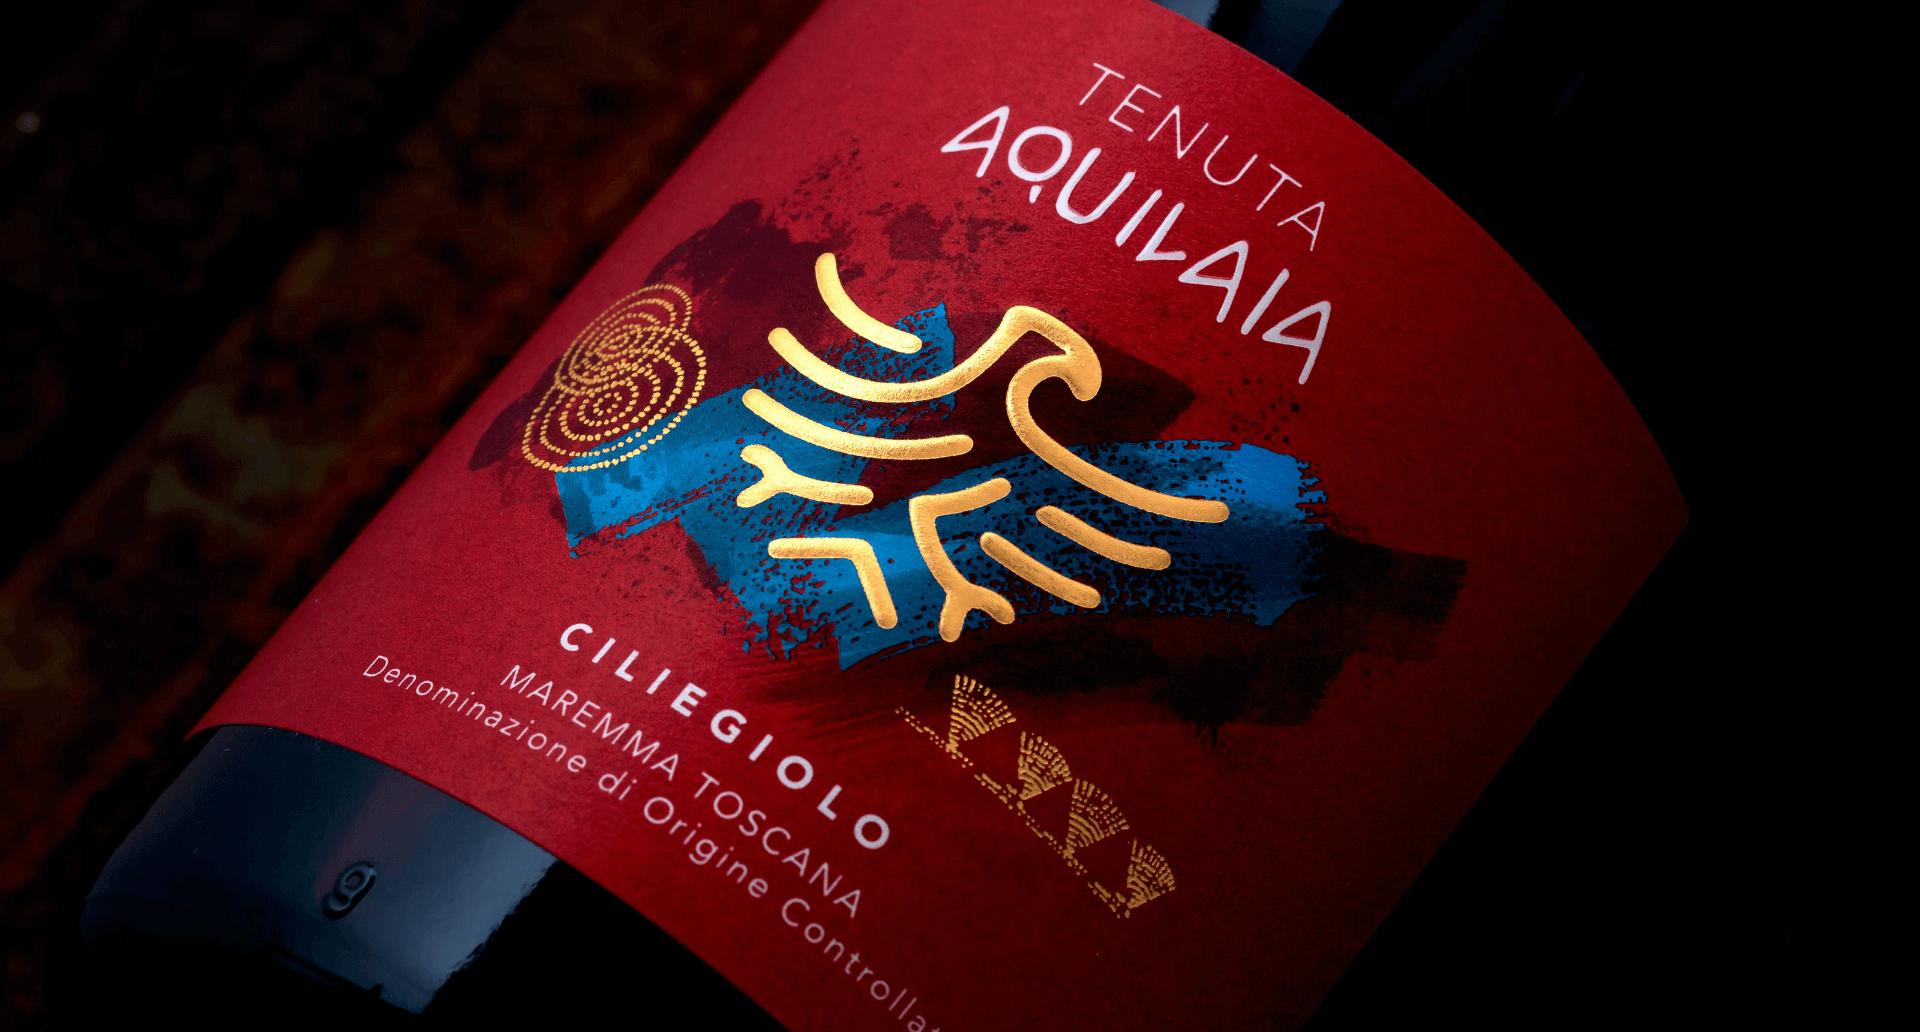 aquilaia-auspici-vino-ciliegiolo-maremma-toscana